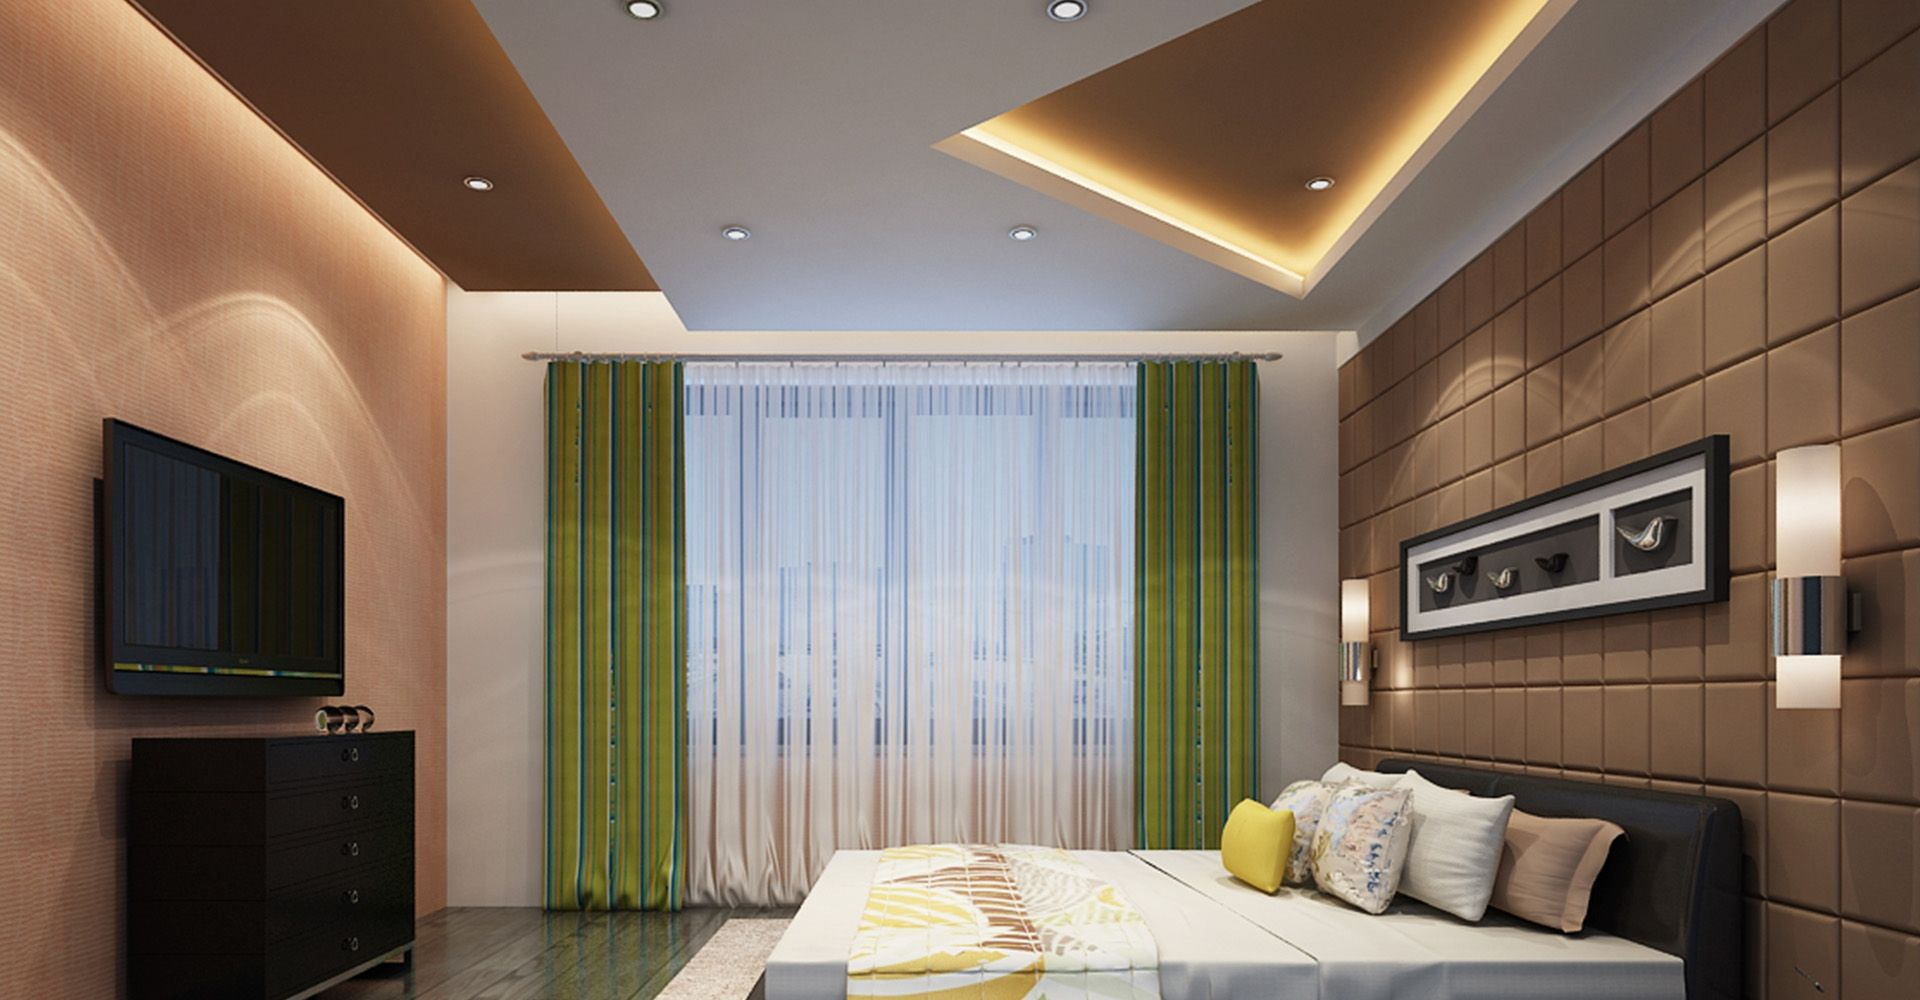 Master bedroom gypsum ceiling  Bedroom False Ceiling Ideas  Bedroom Ideas  Pinterest  False